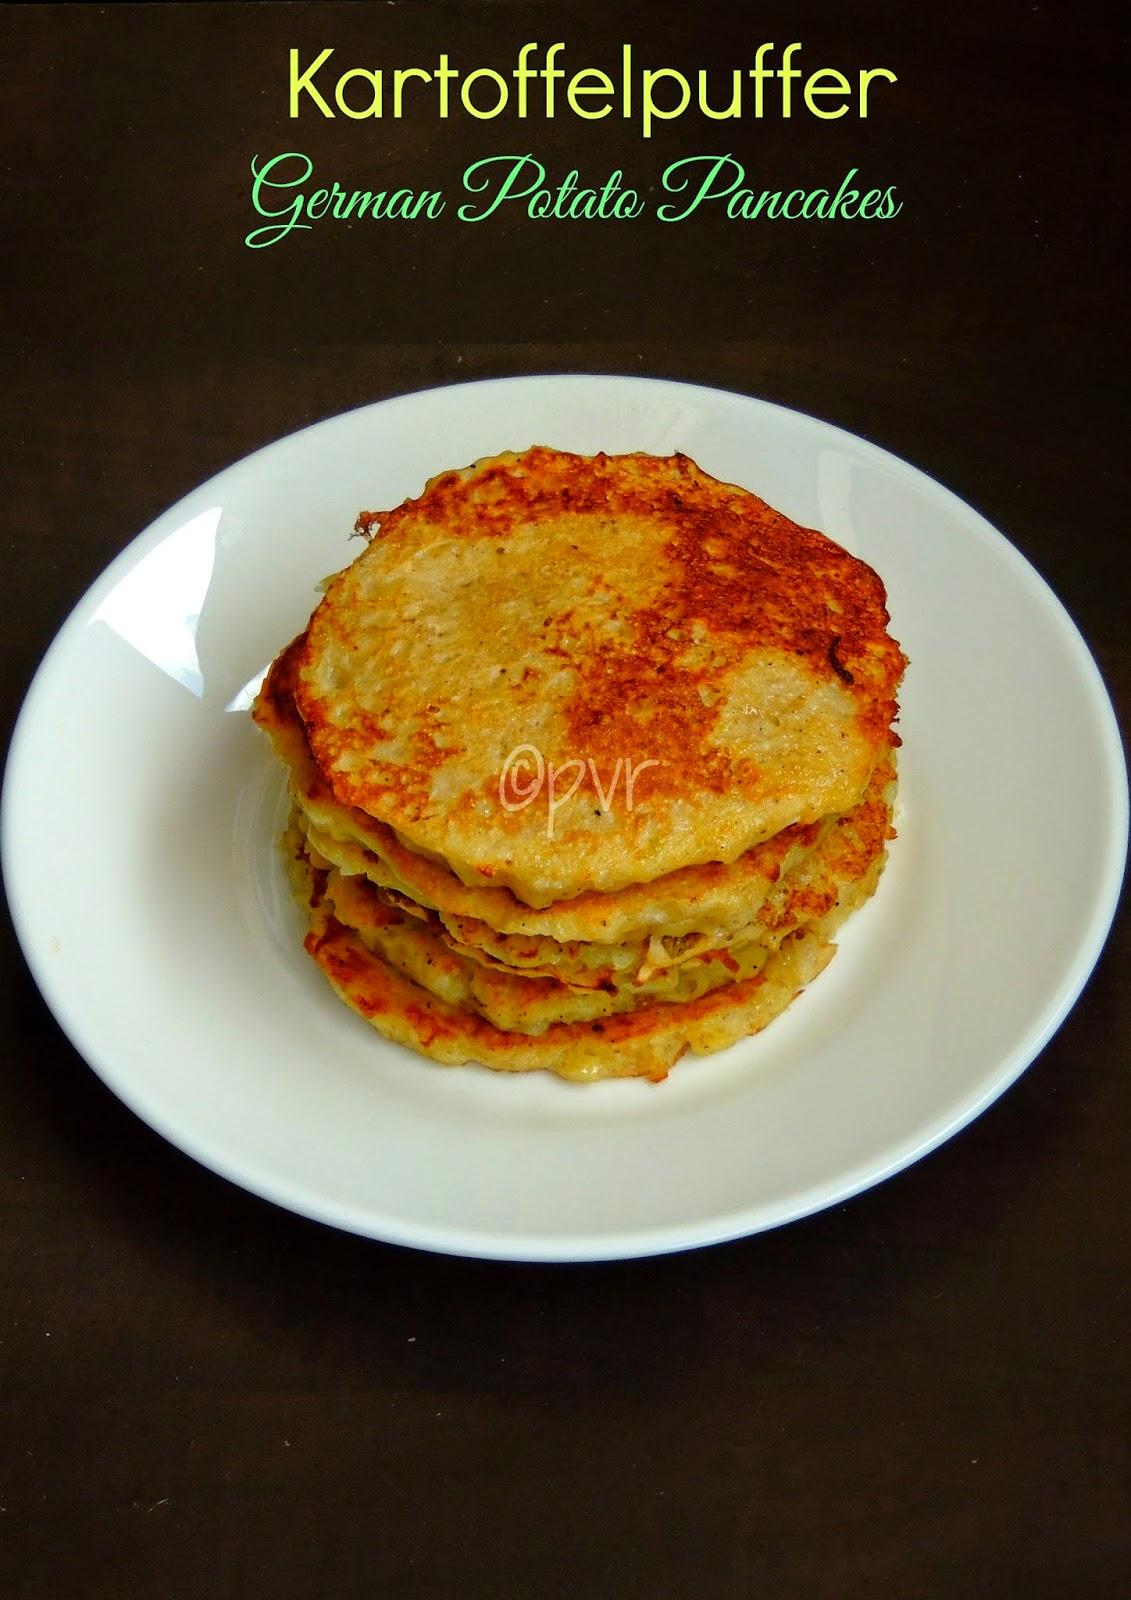 Kartoffelpuffer, Kartoffenkuche, German Potato Pancakes